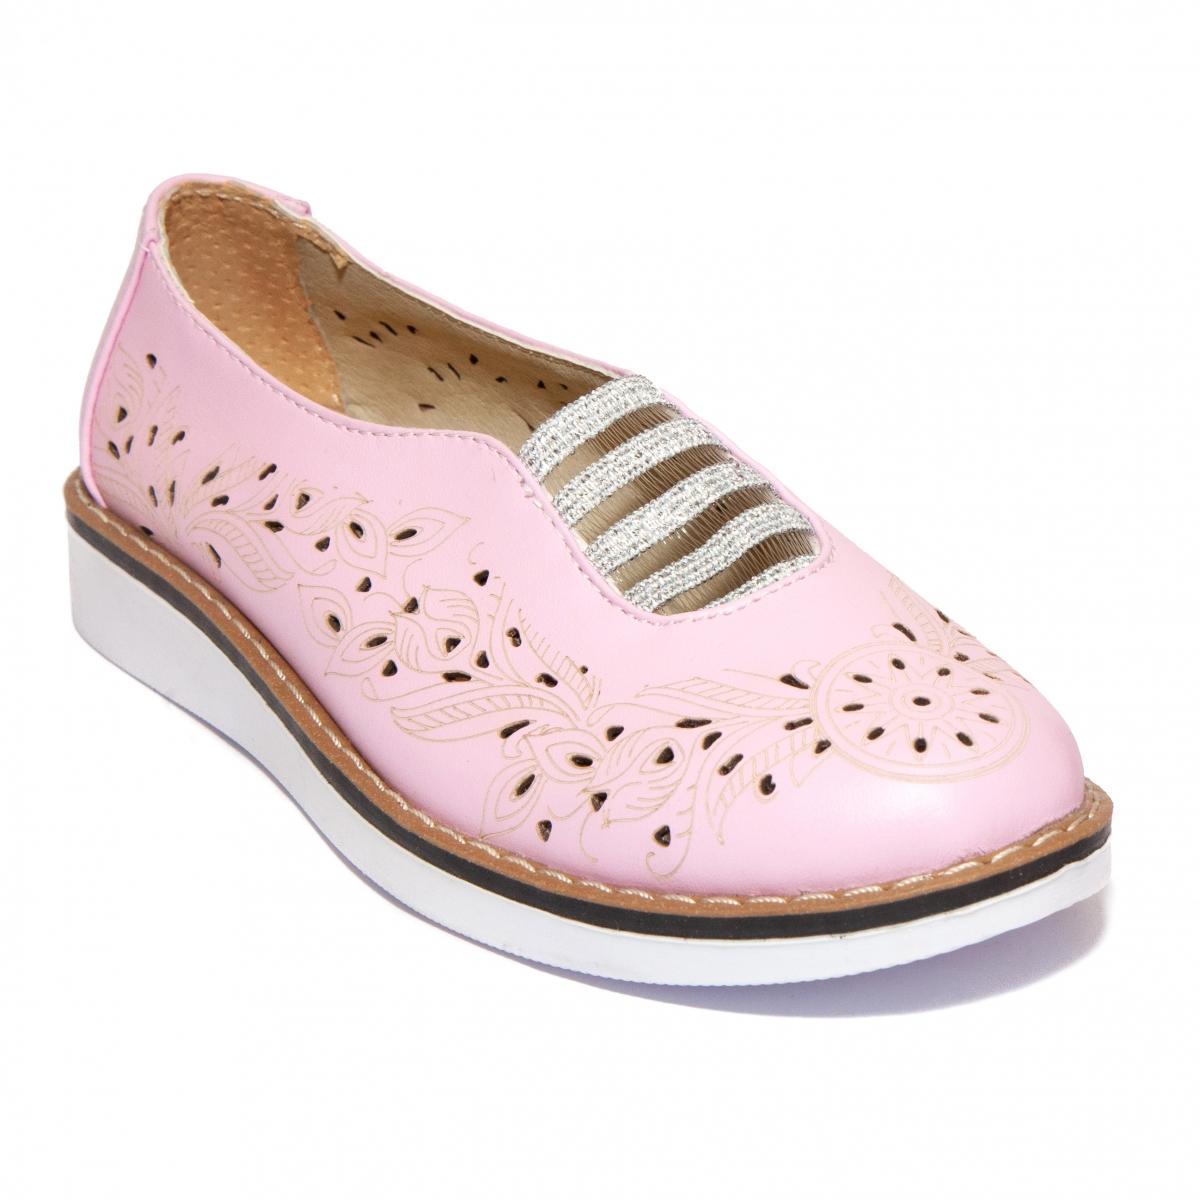 Pantofi fete perforati laser 1907 lila 26-40